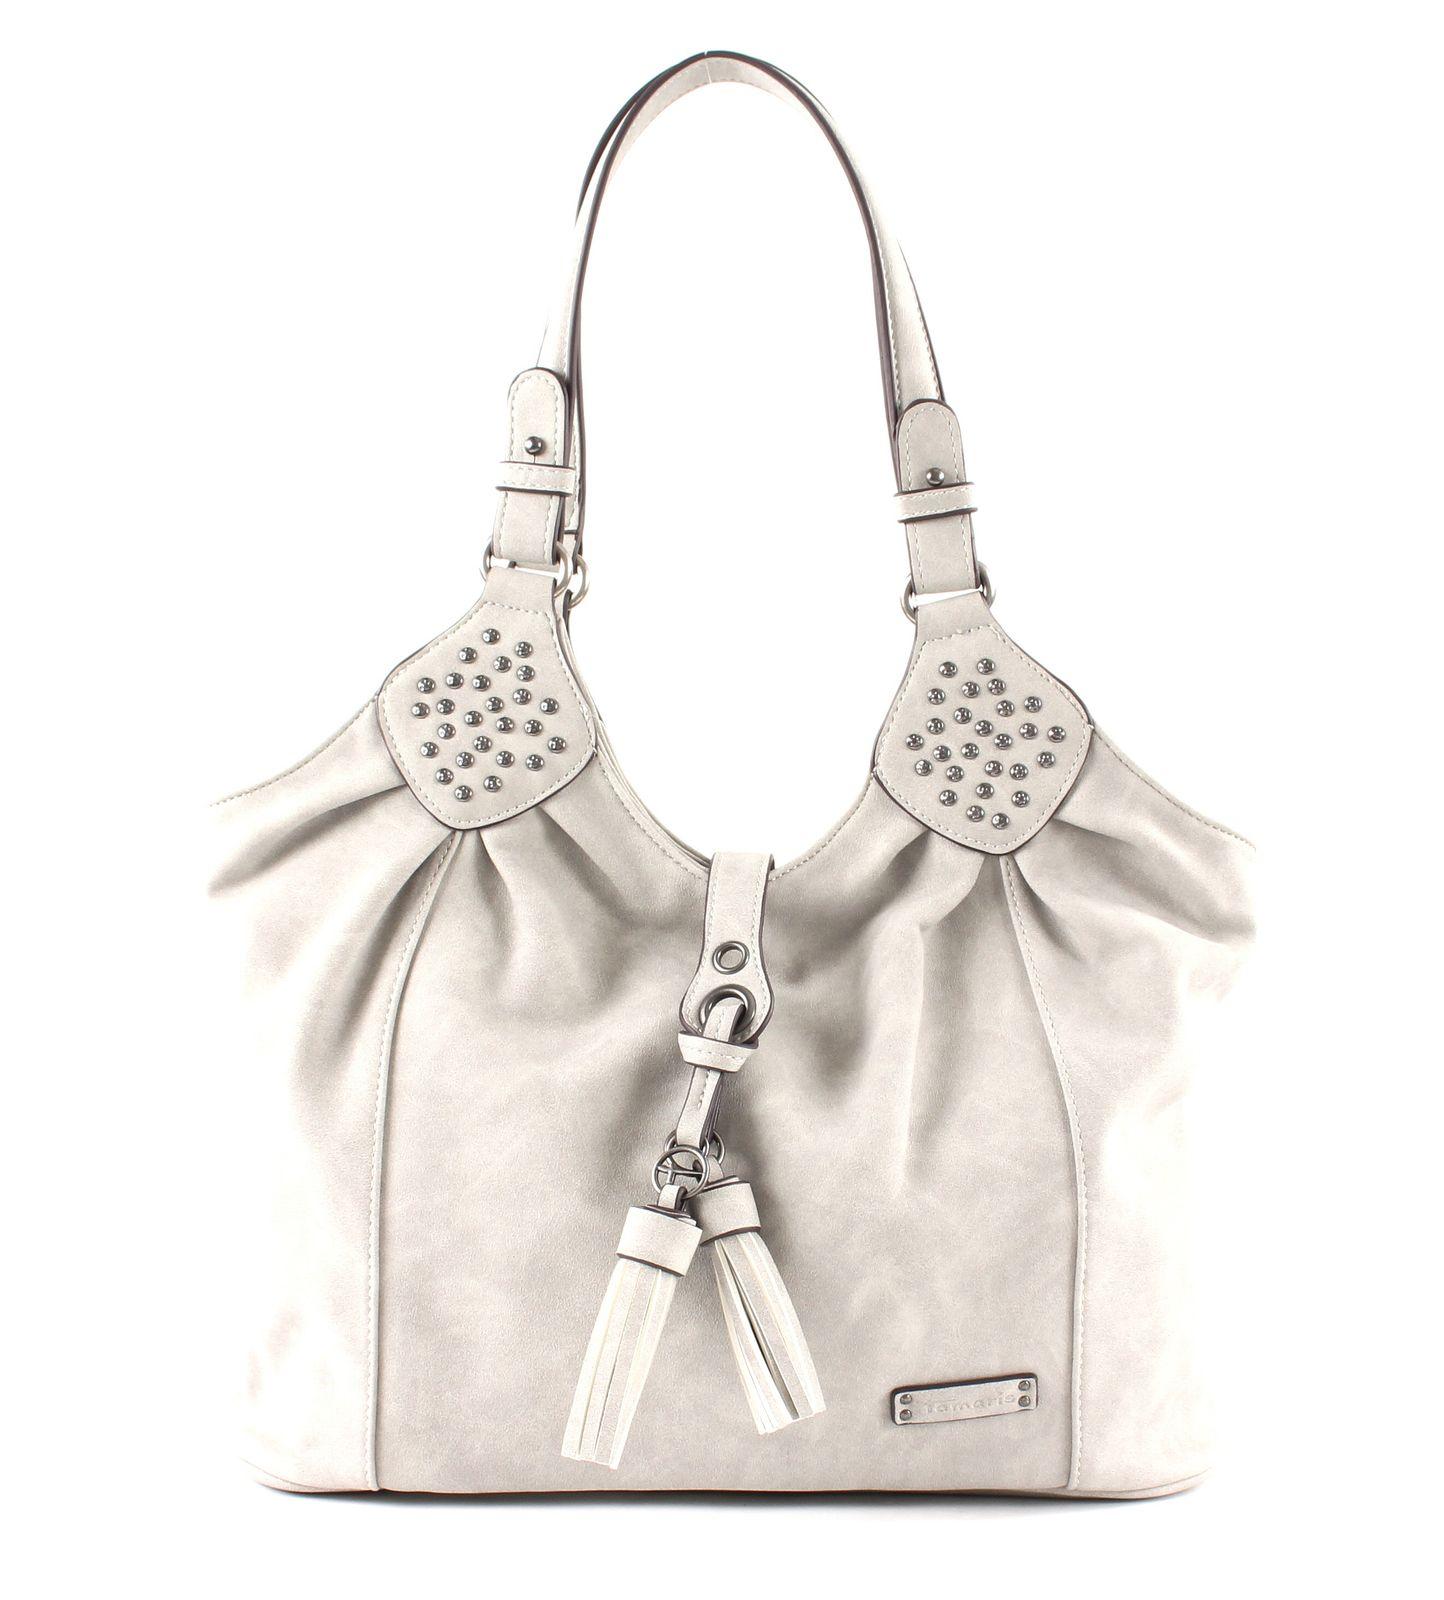 Details zu Tamaris Adelia Shoulder Bag Schultertasche Tasche Light Grey Grau Neu